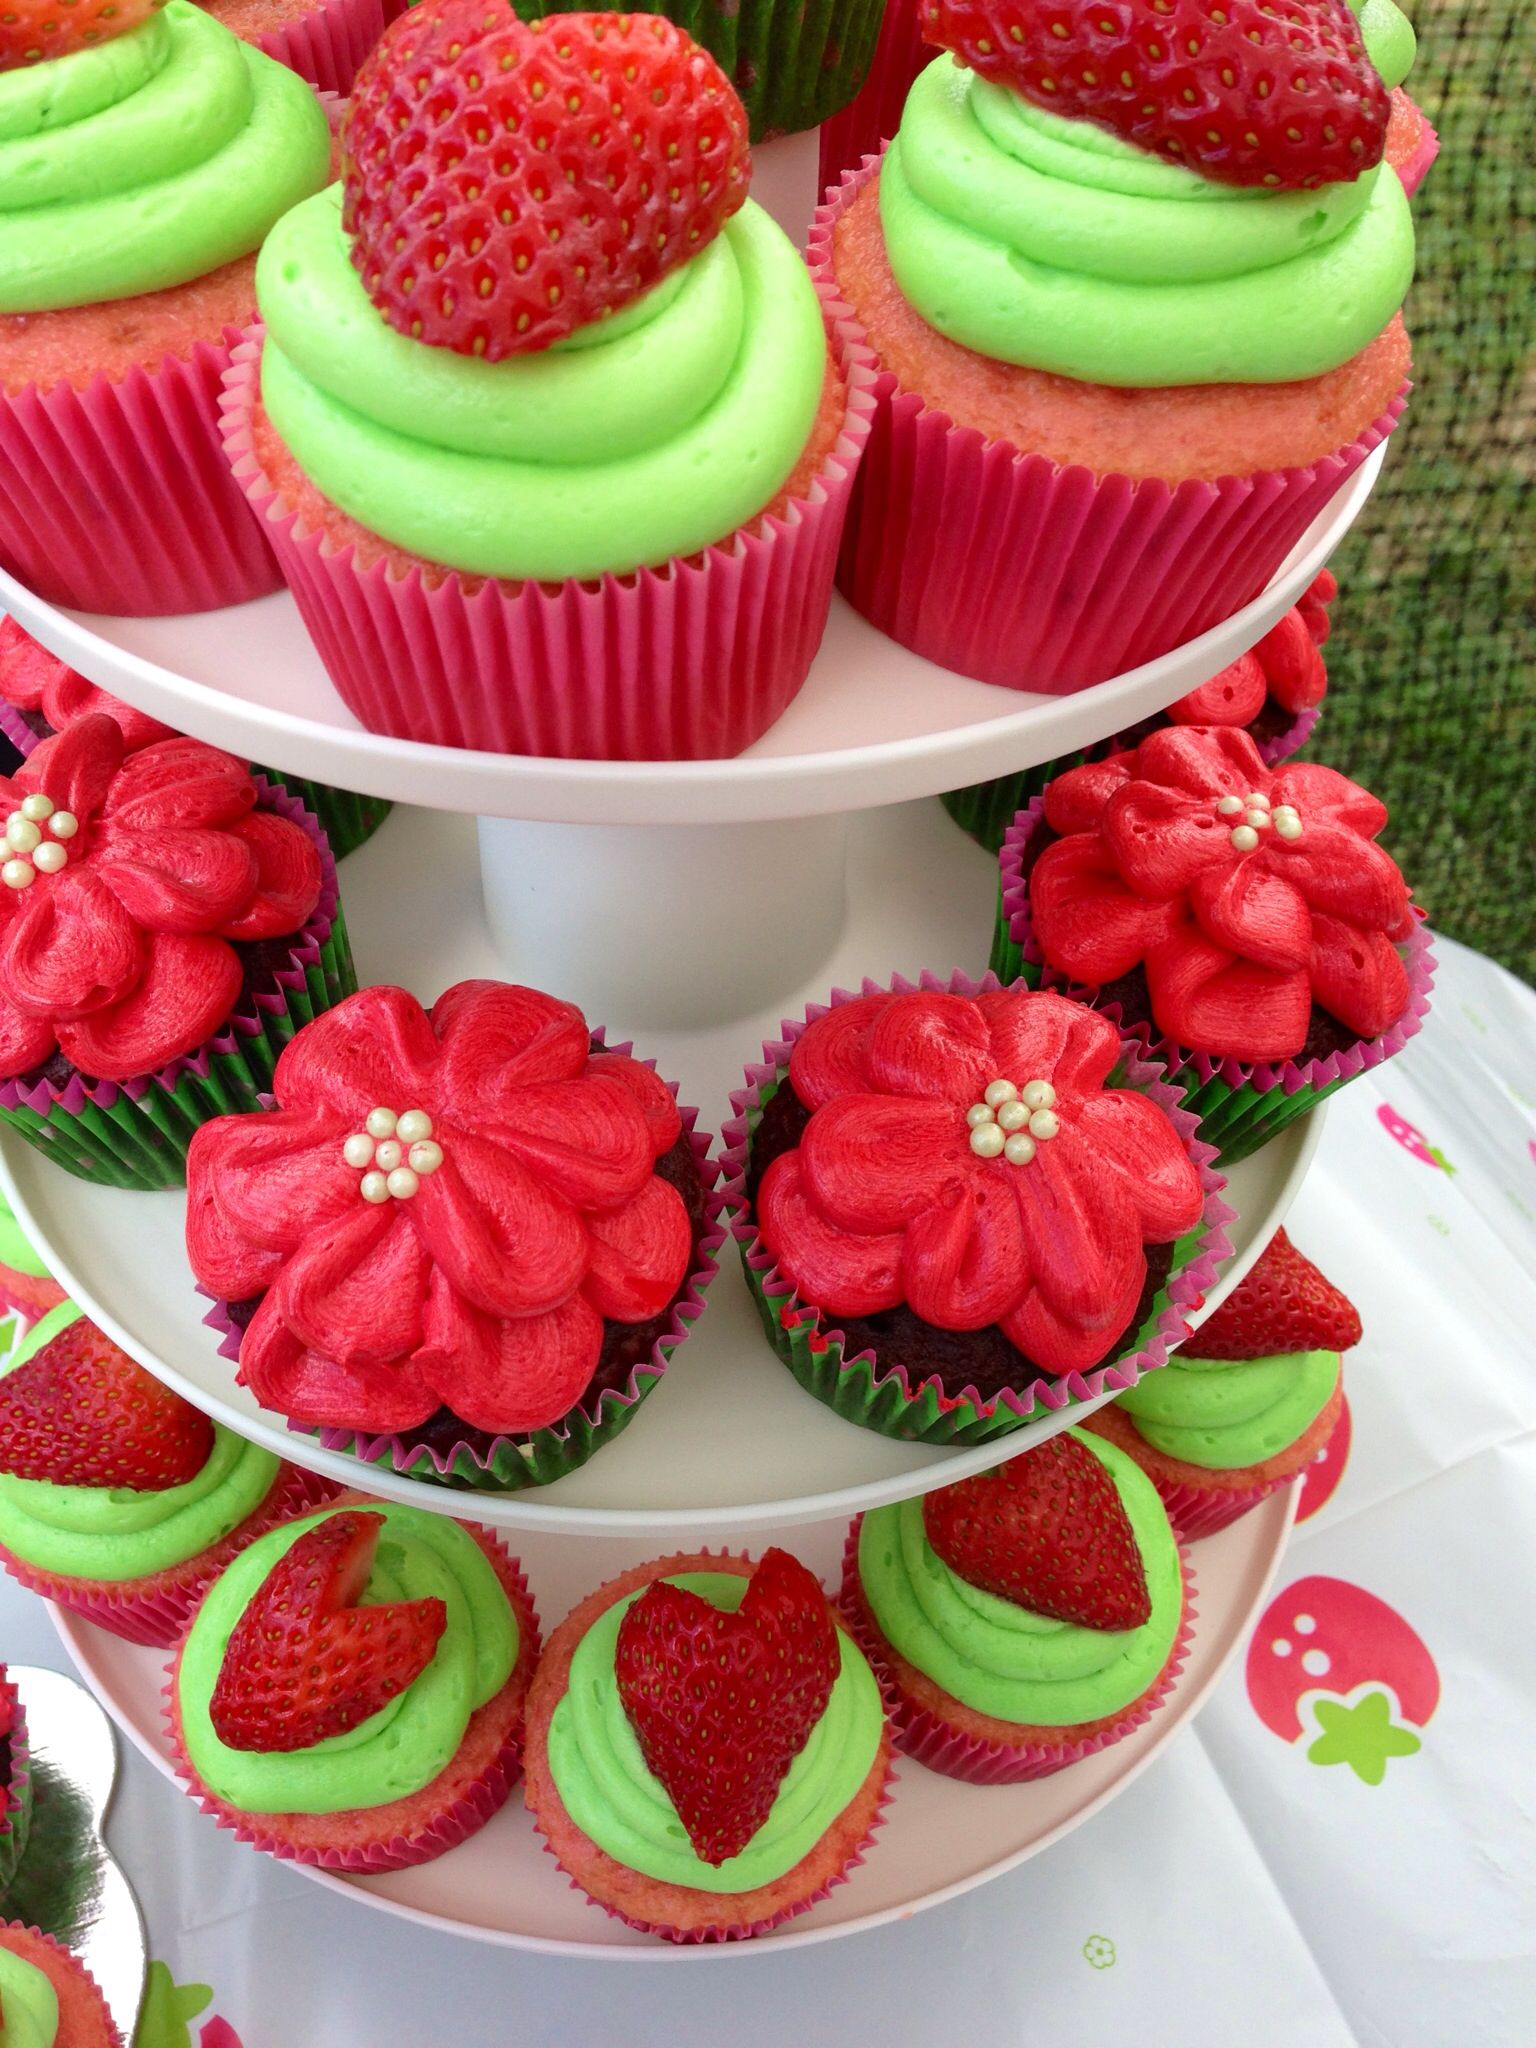 Strawberry Shortcake theme cupcakes